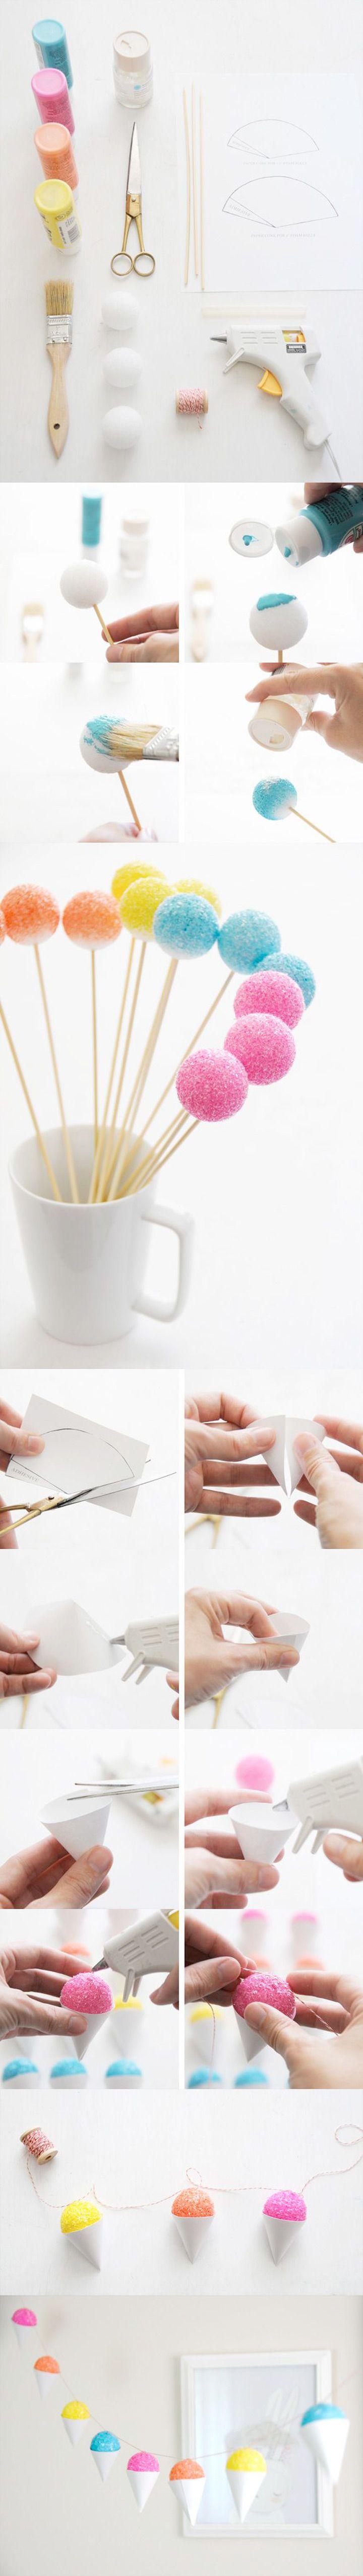 DIY Garland For Your Dorm Room